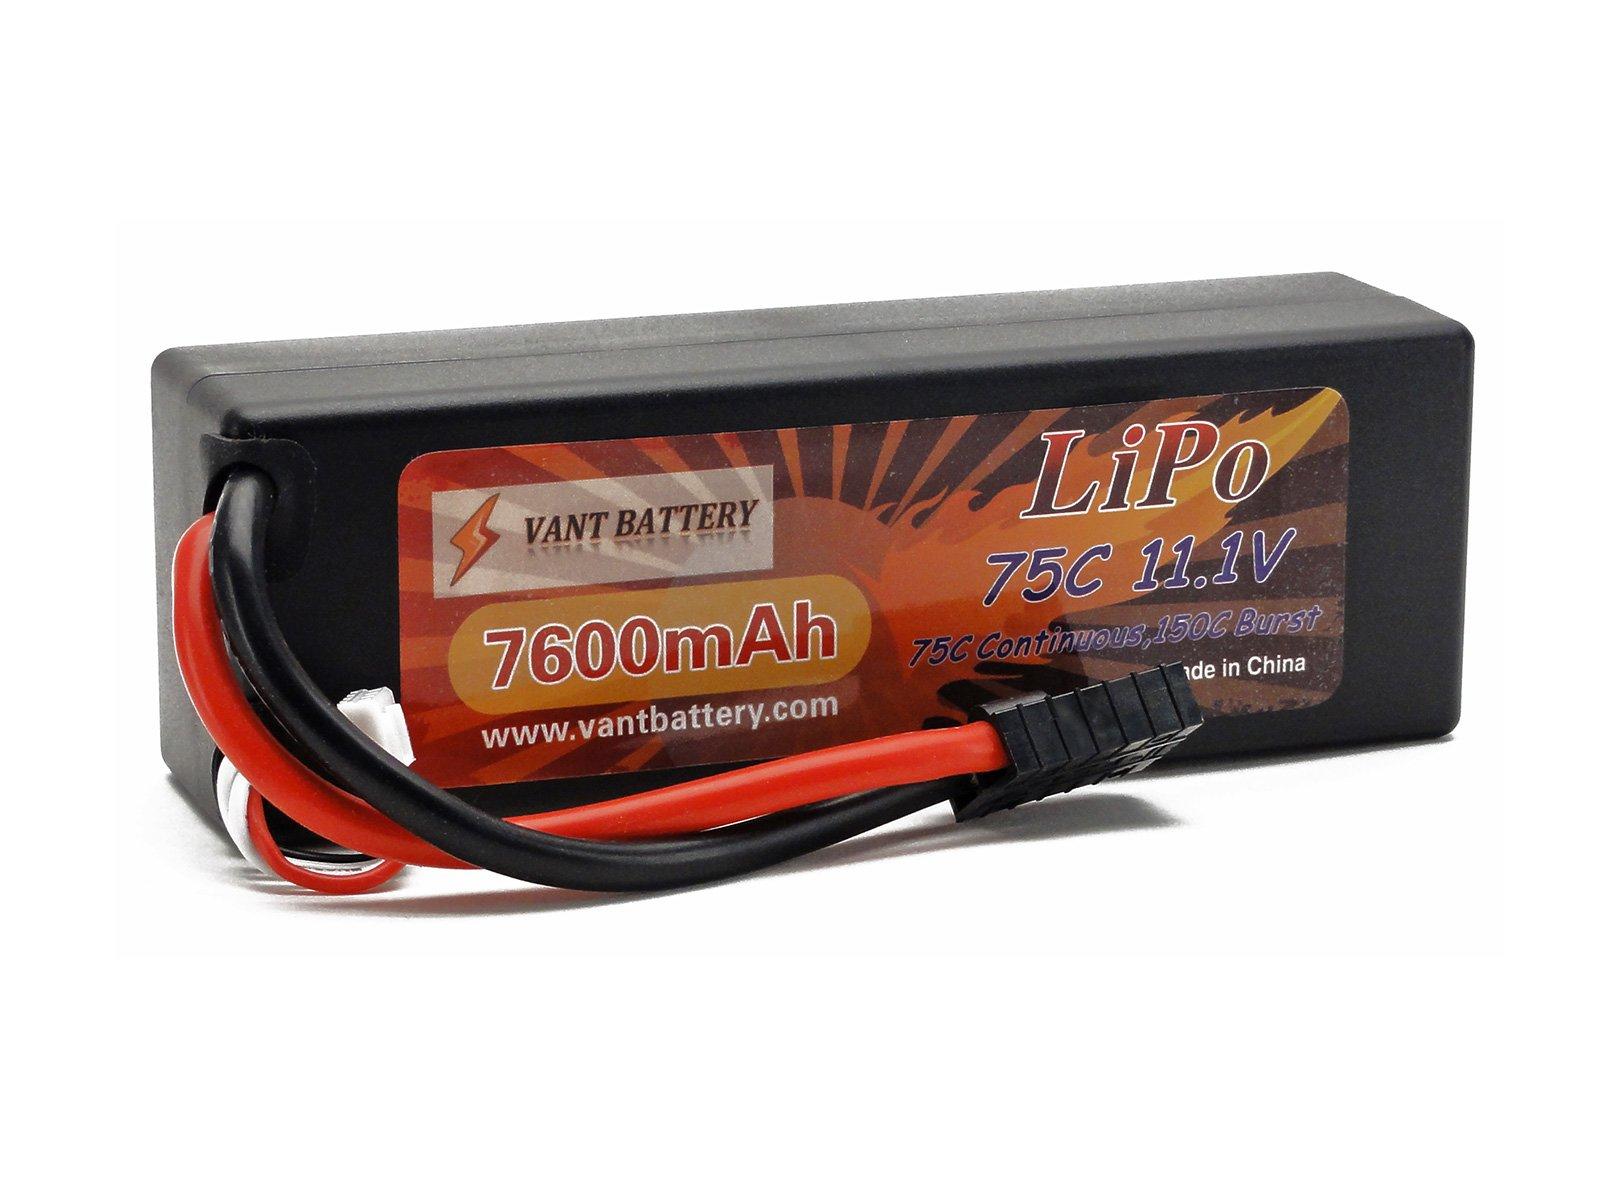 7600mAh 75C 150C HardCase Battery Connector